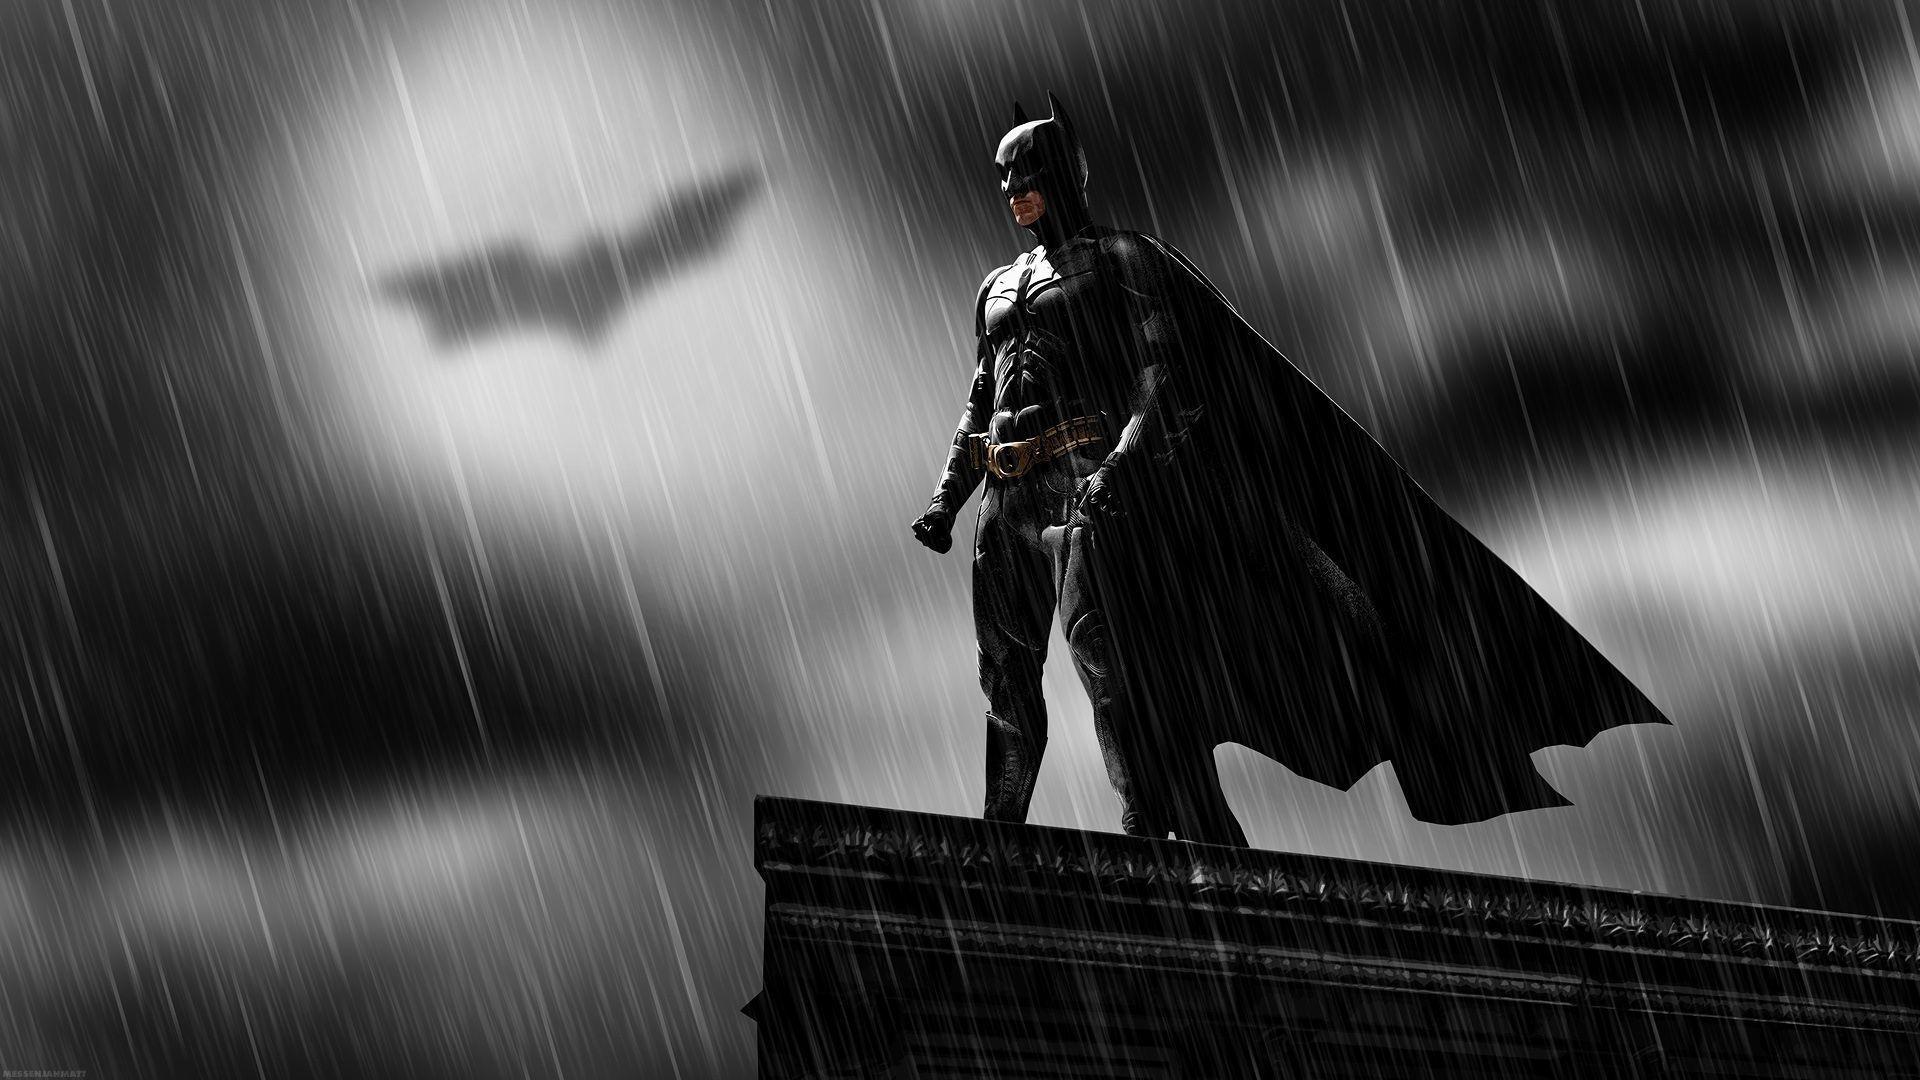 Batman HD Wallpaper ·① Download Free High Resolution